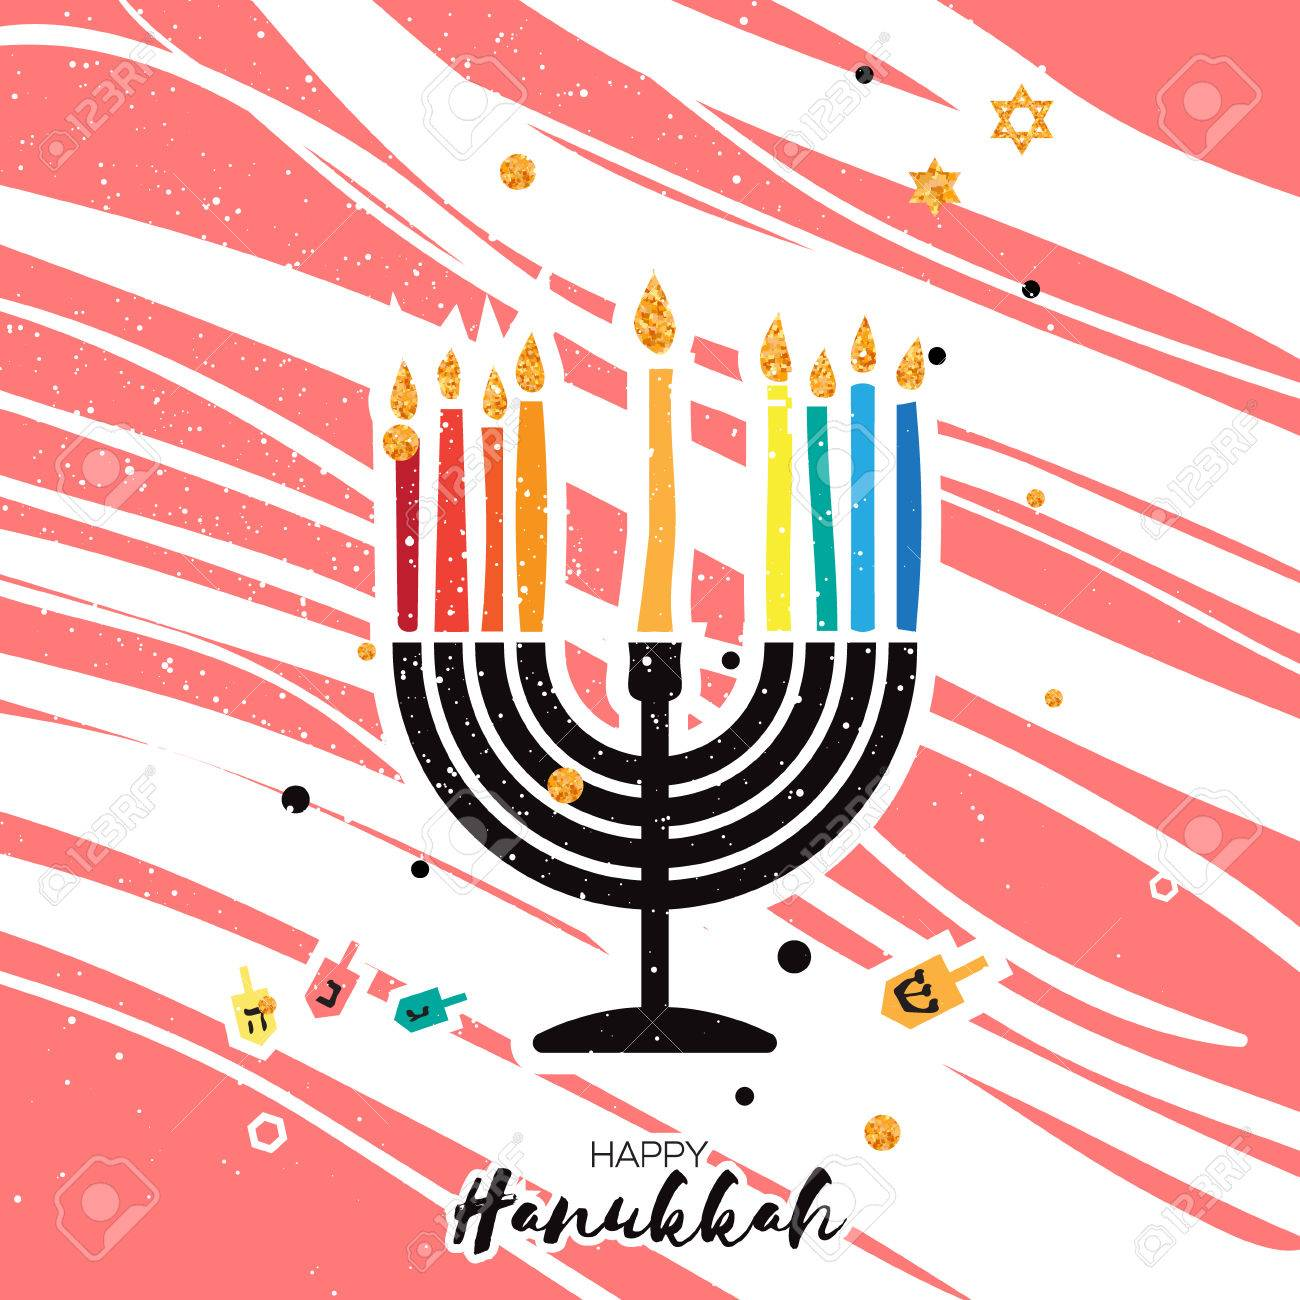 Cute happy hanukkah greeting card jewish holiday with menorah cute happy hanukkah greeting card jewish holiday with menorah traditional candelabra candles and m4hsunfo